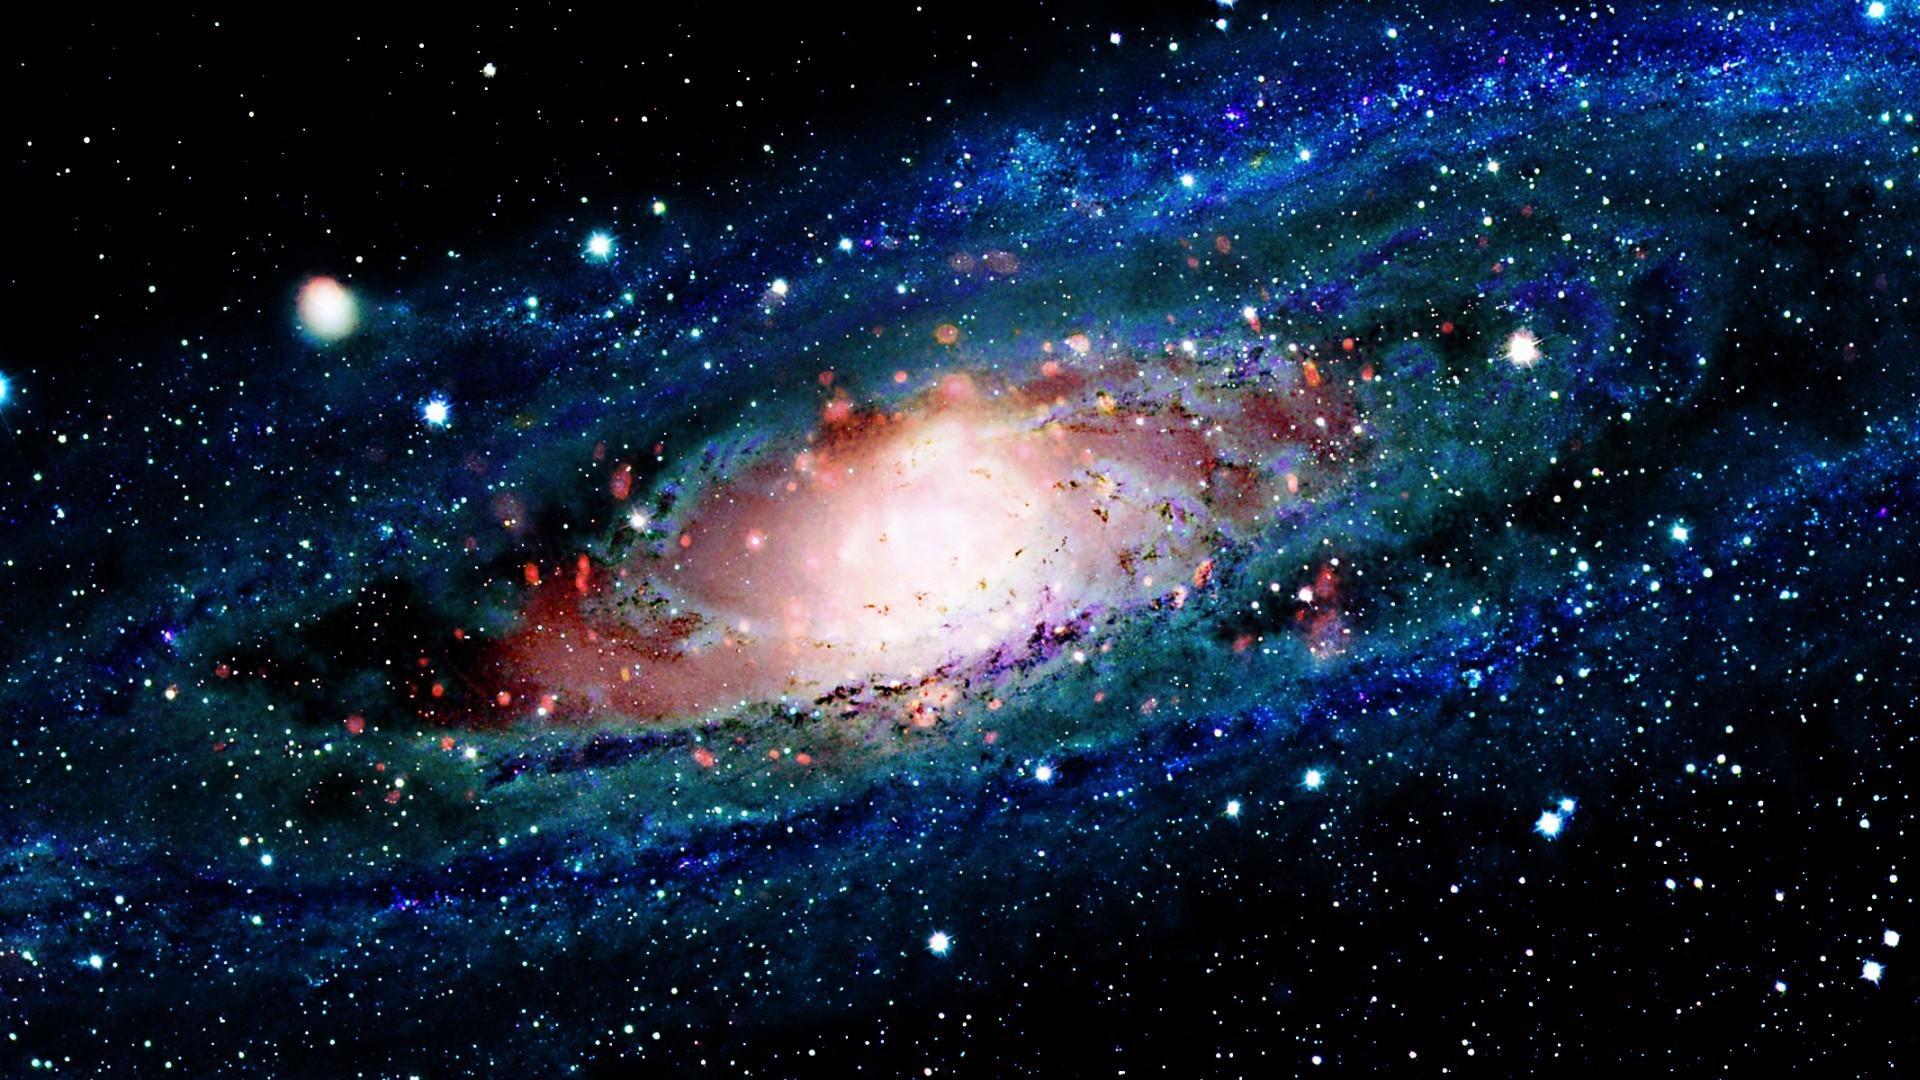 Galaxy Backgrounds 3840x2160 Samsung